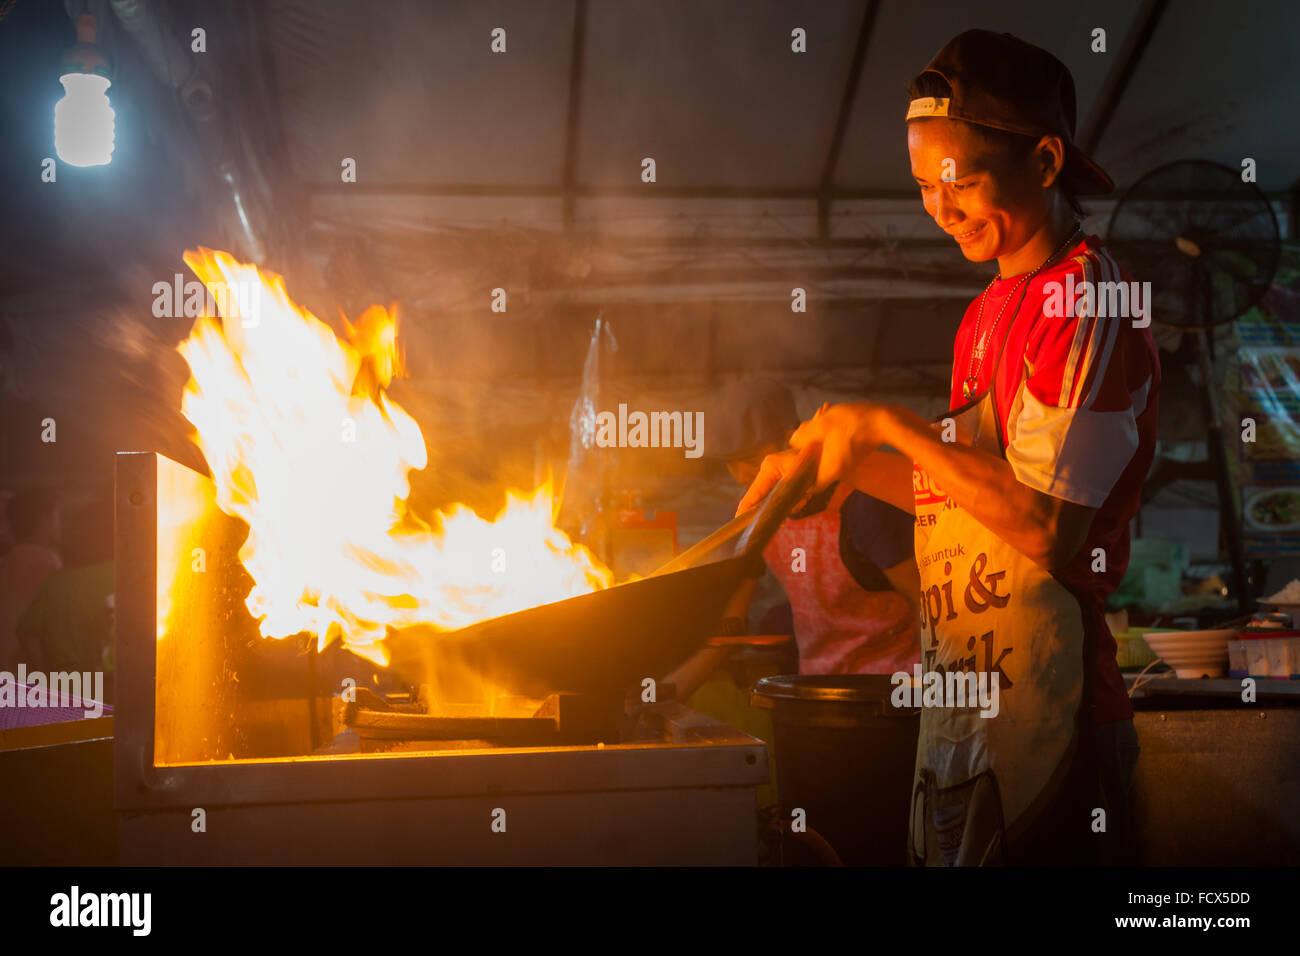 A cook uses a wok frying pan to cook noodles and has flames around his pan, the market, Kota Kinabalu, Malaysia - Stock Image